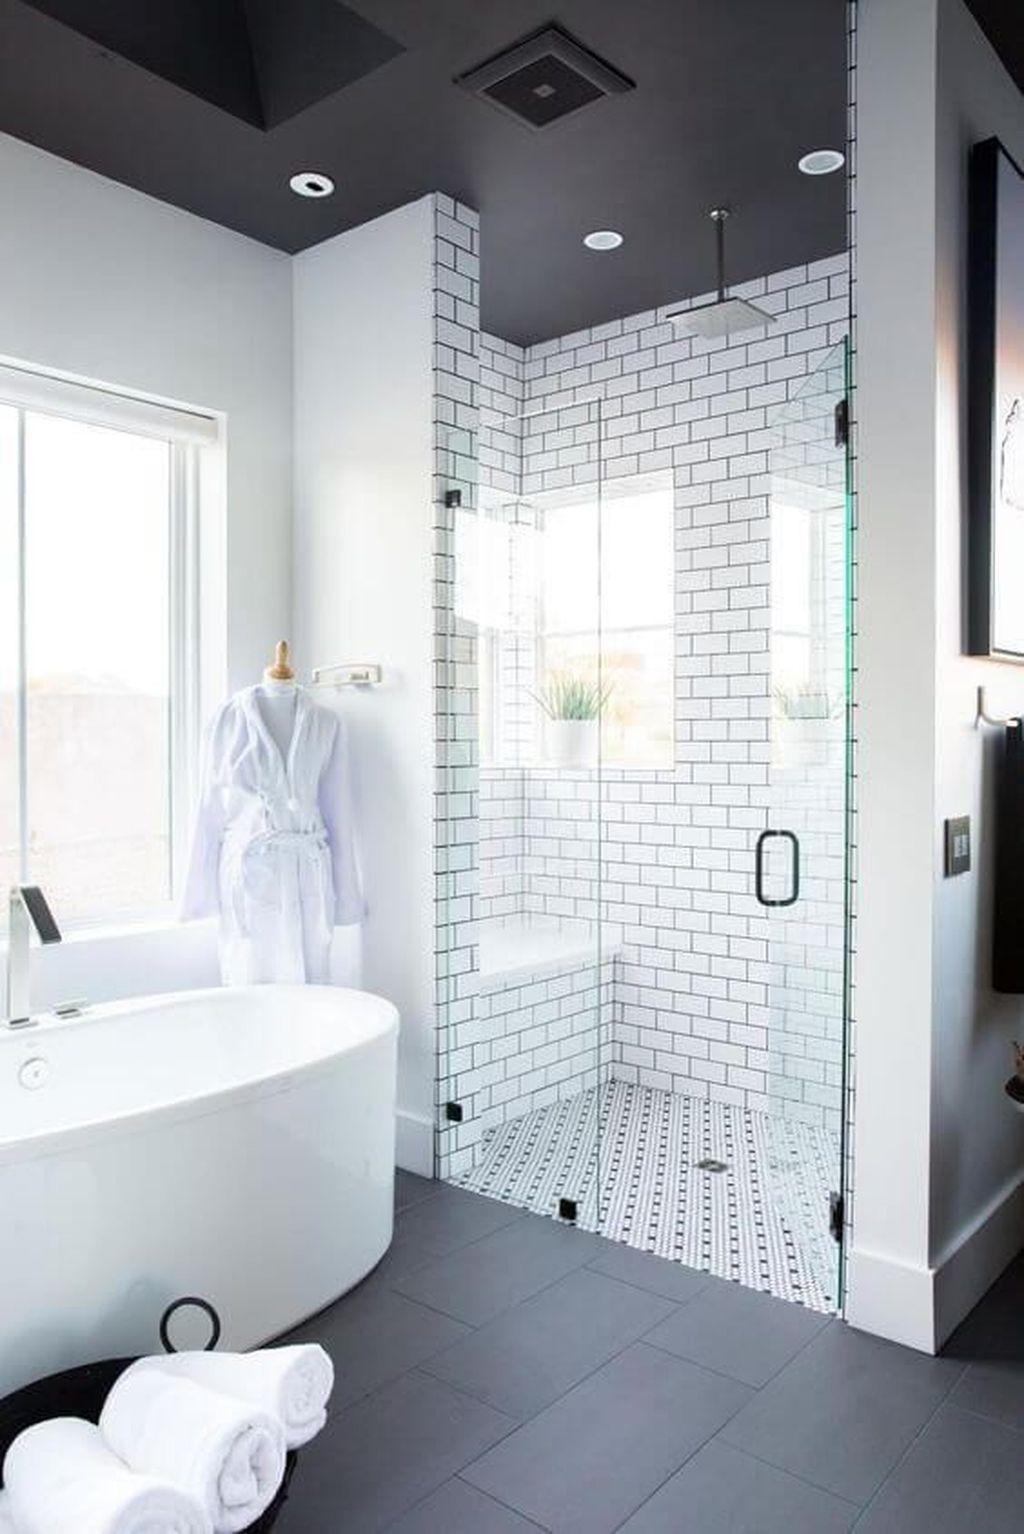 Lovely Bathroom Ceramic Tile Ideas You Should Copy 13